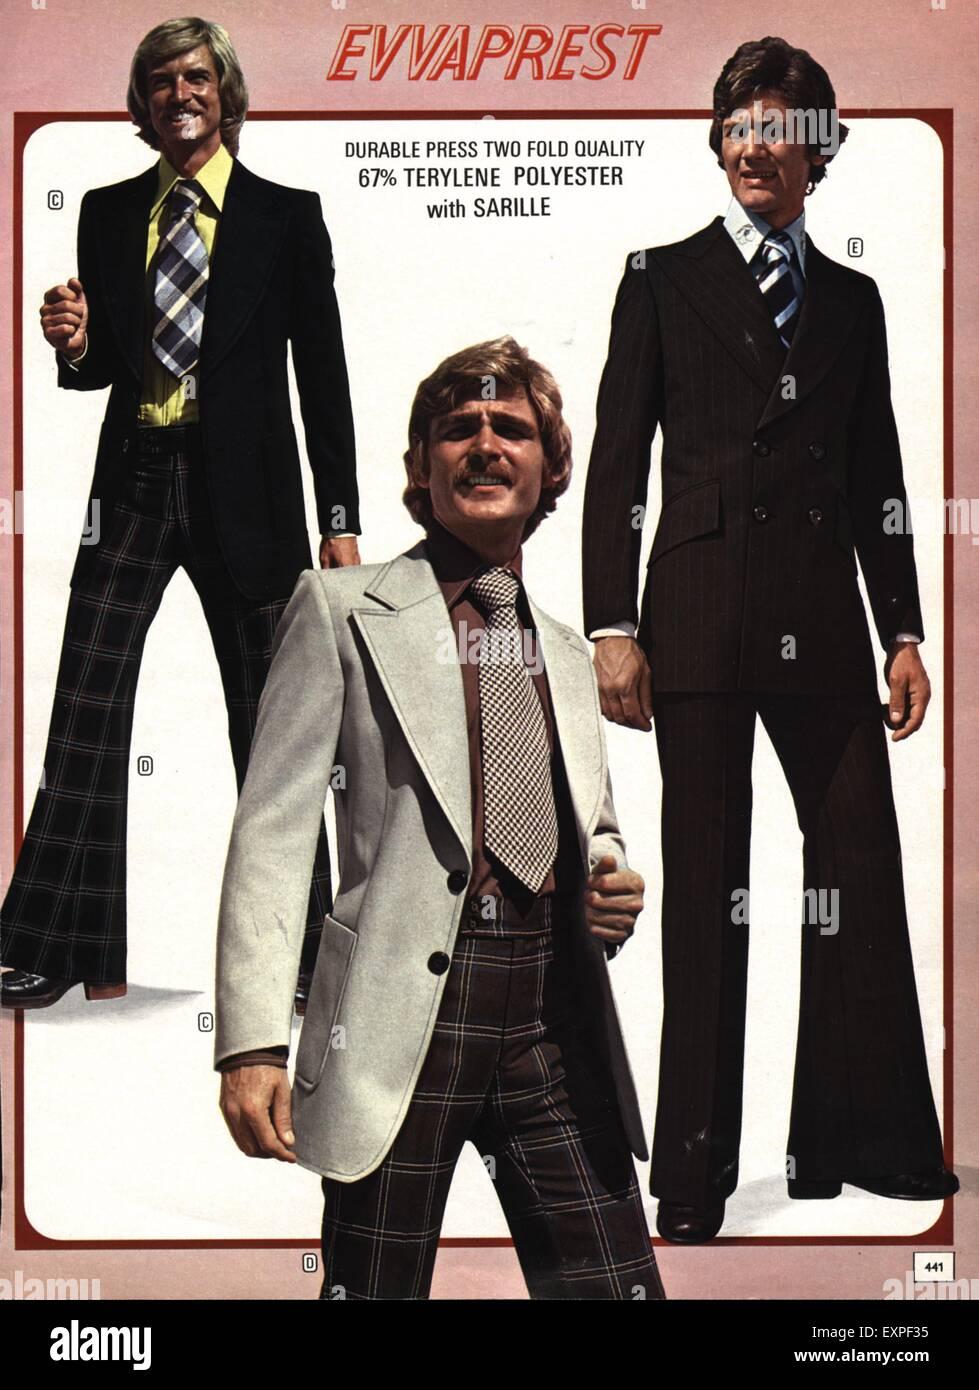 37ba97f806 1970s UK Mens Fashion 1970s Catalogue/ Brochure Plate Stock Photo ...